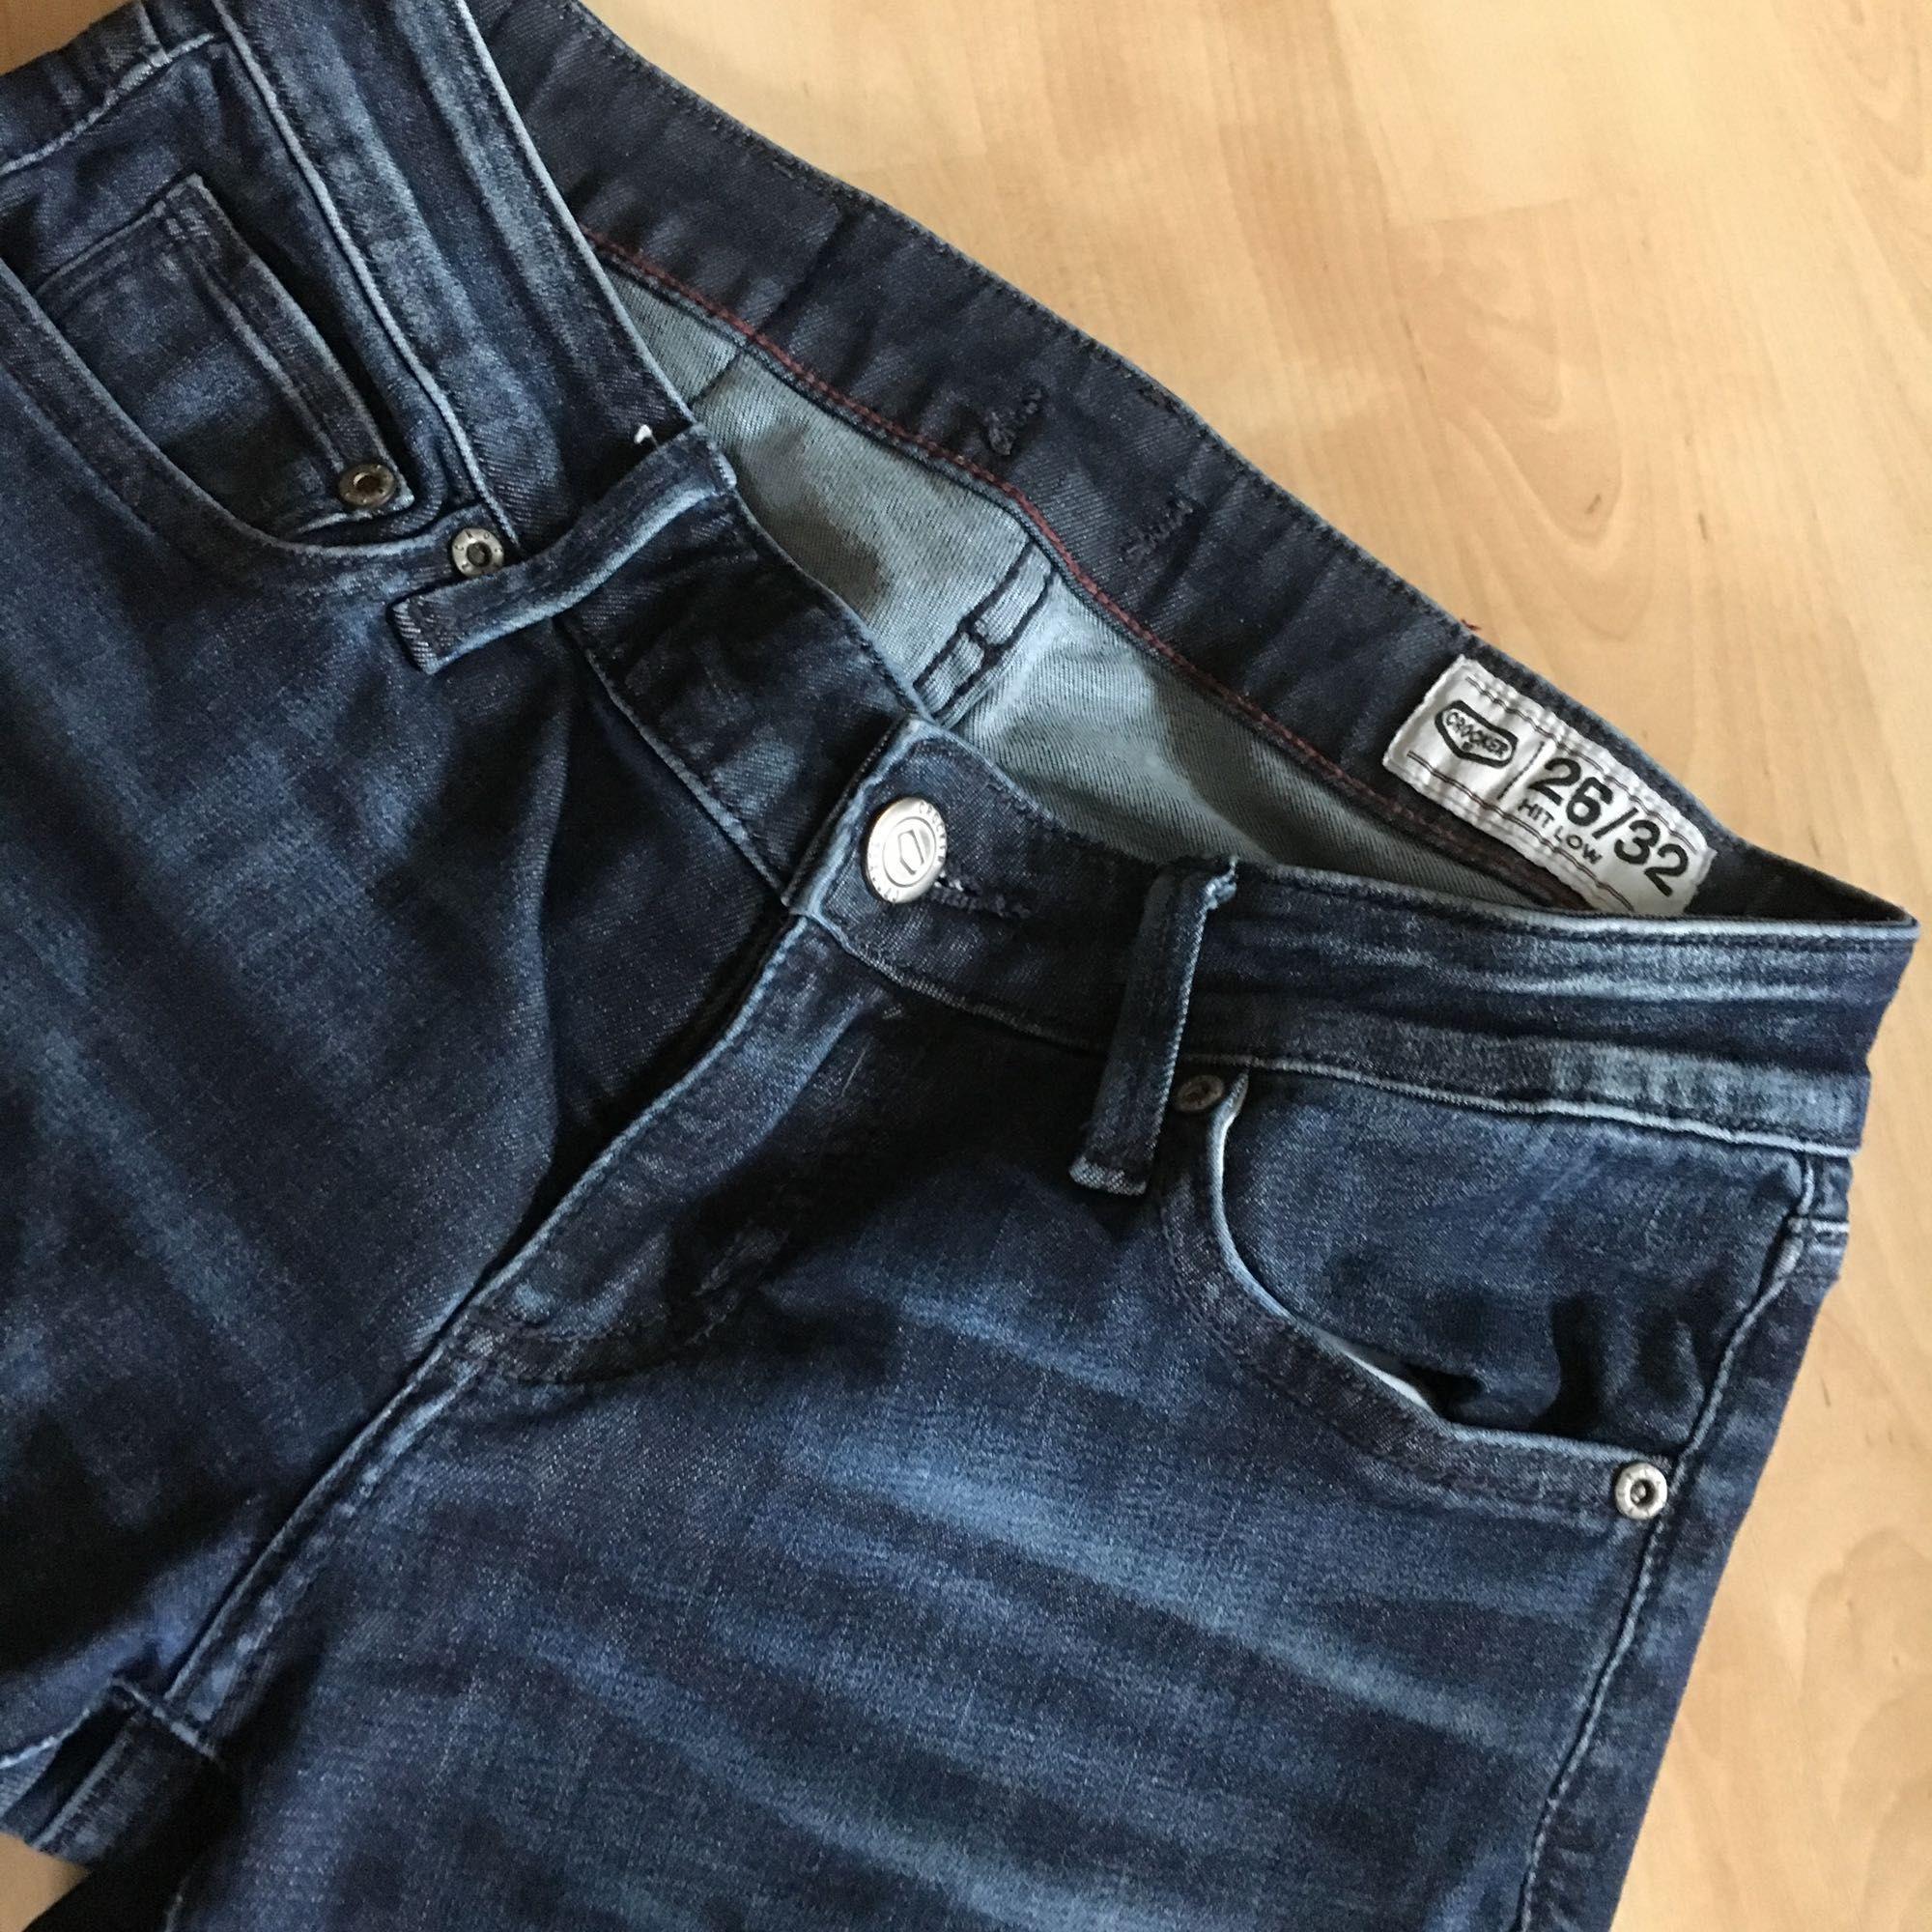 Oanvända mörkblåa Crocker jeans i modellen Hit Low